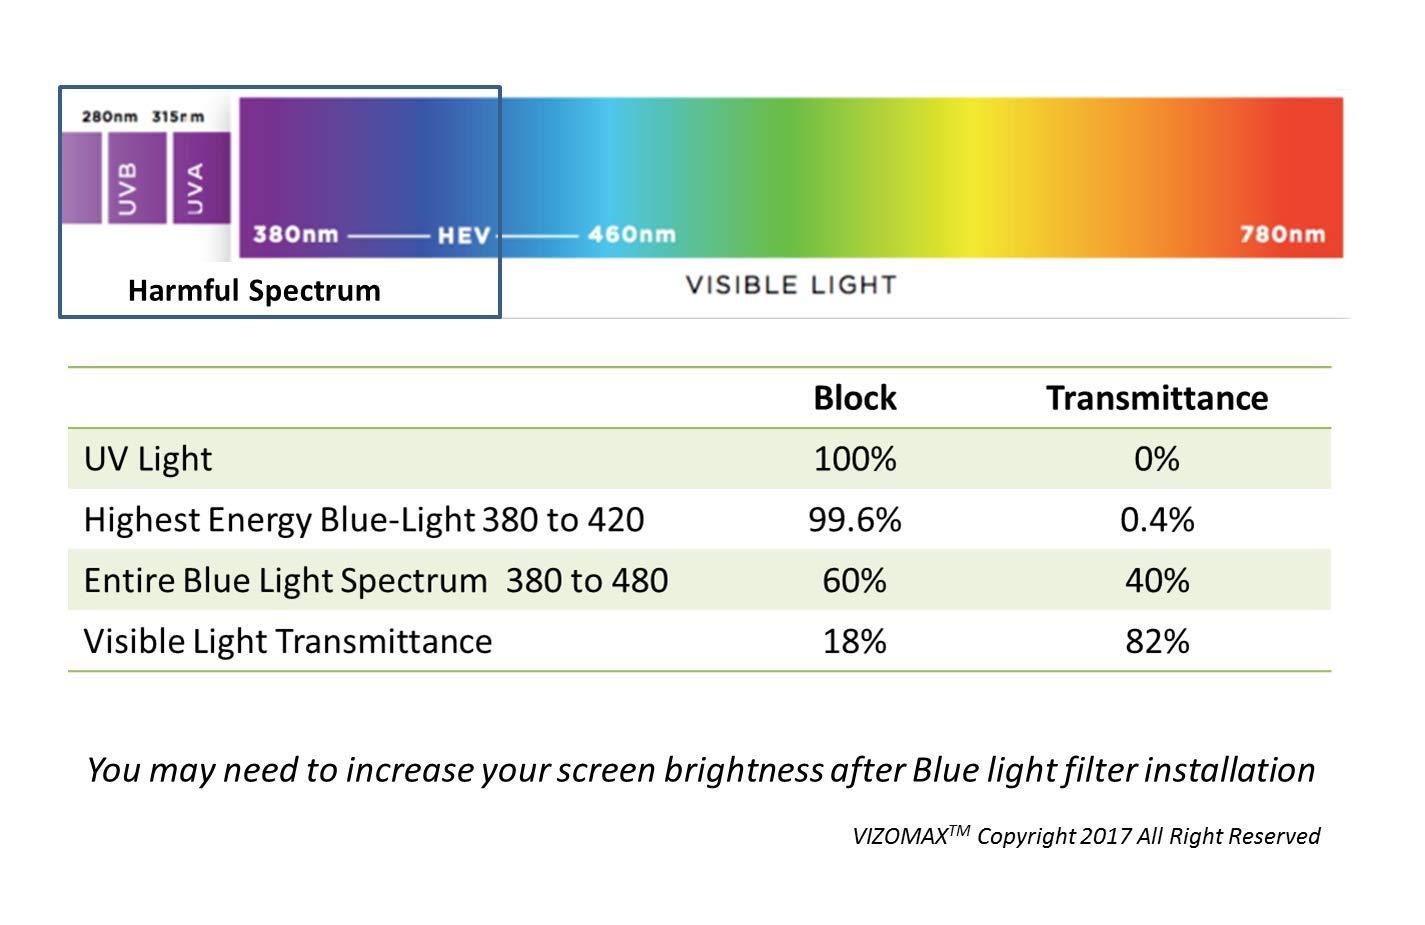 23 - 24 inch Anti-blue Light Vizomax Monitor/TV Screen Protector for LCD, LED, Computer & Plasma HDTV